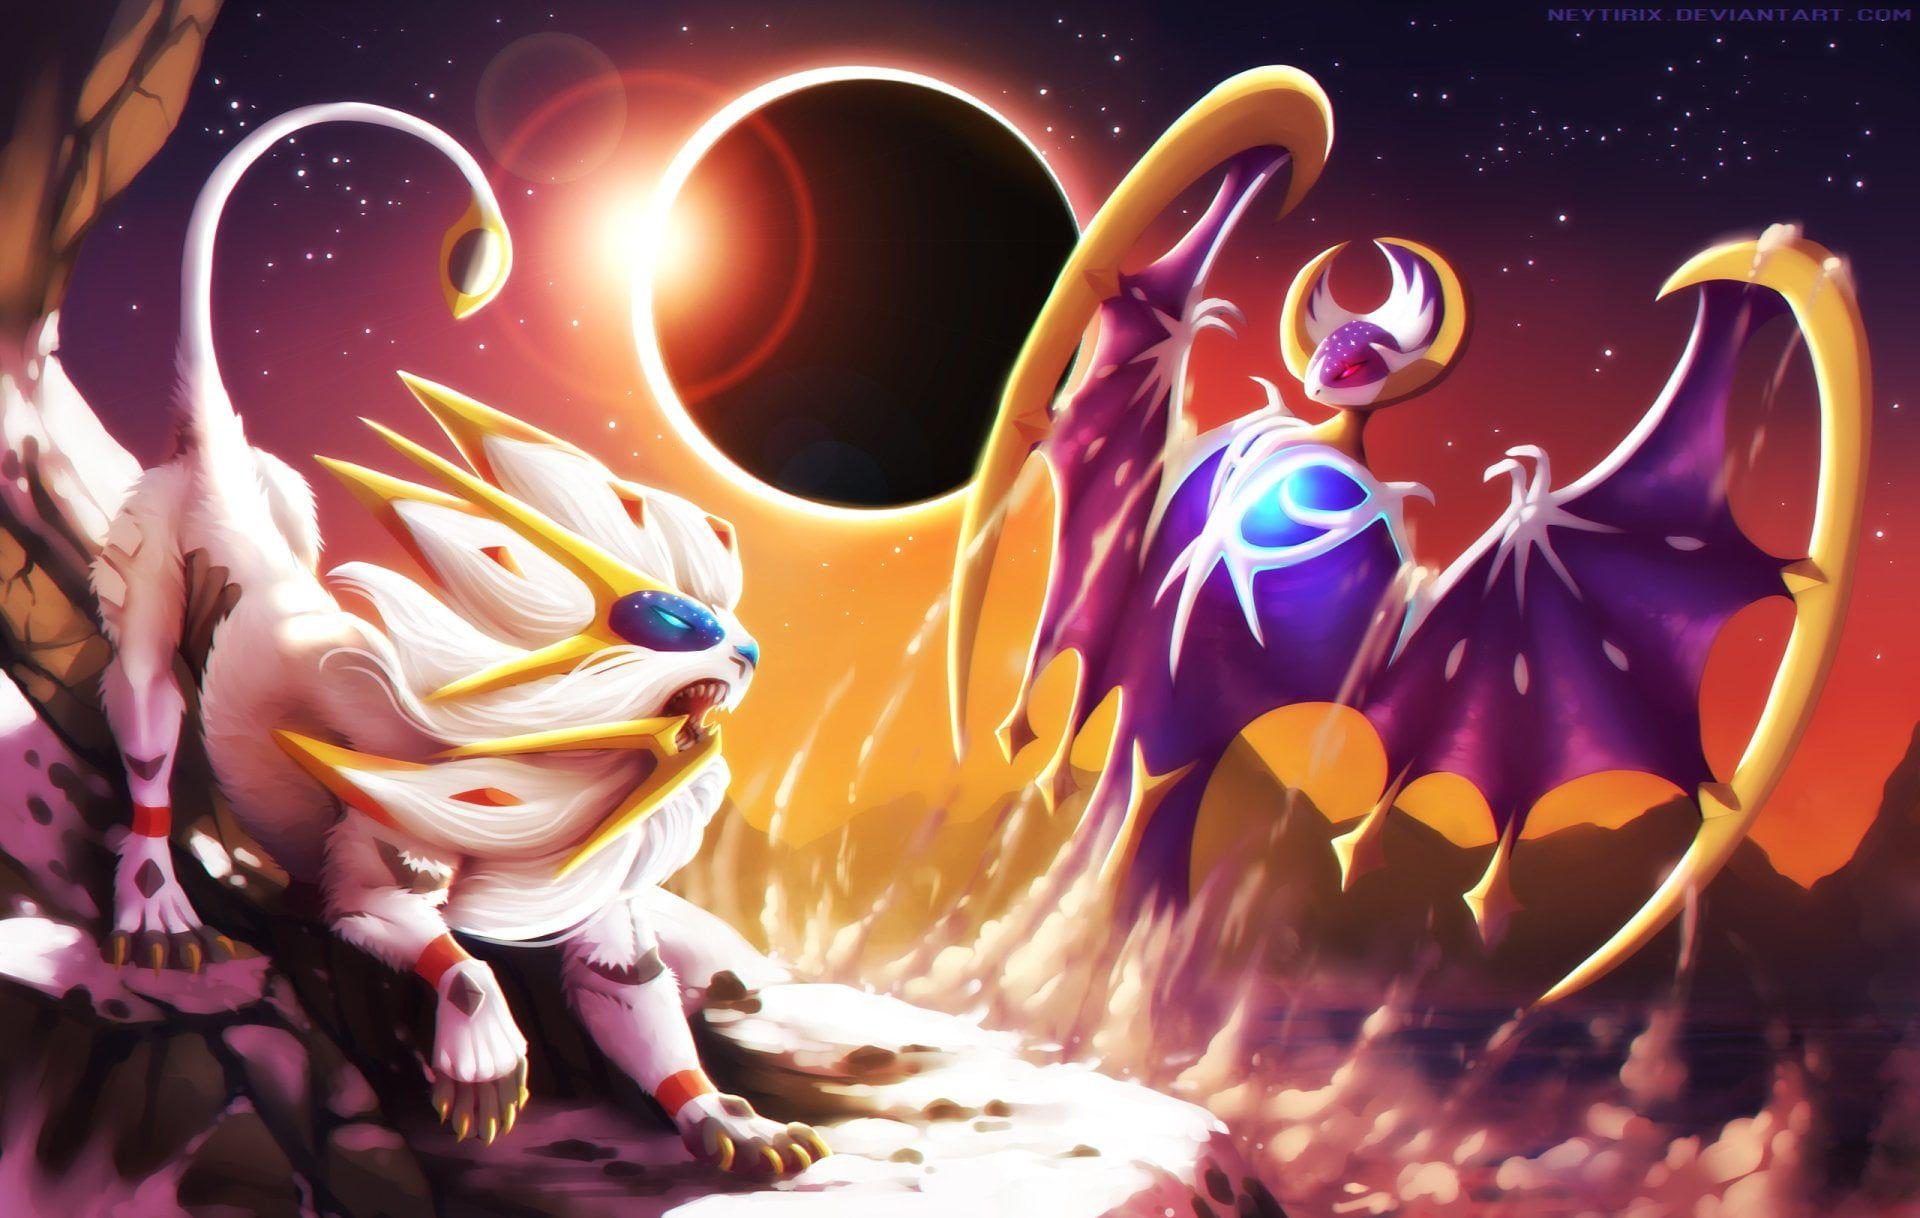 Pokemon Pokemon Sun And Moon Lunala Pokemon Pokemon Sun And Moon Solgaleo Pokemon 1080p Cool Pokemon Wallpapers Pikachu Wallpaper Cute Pokemon Wallpaper